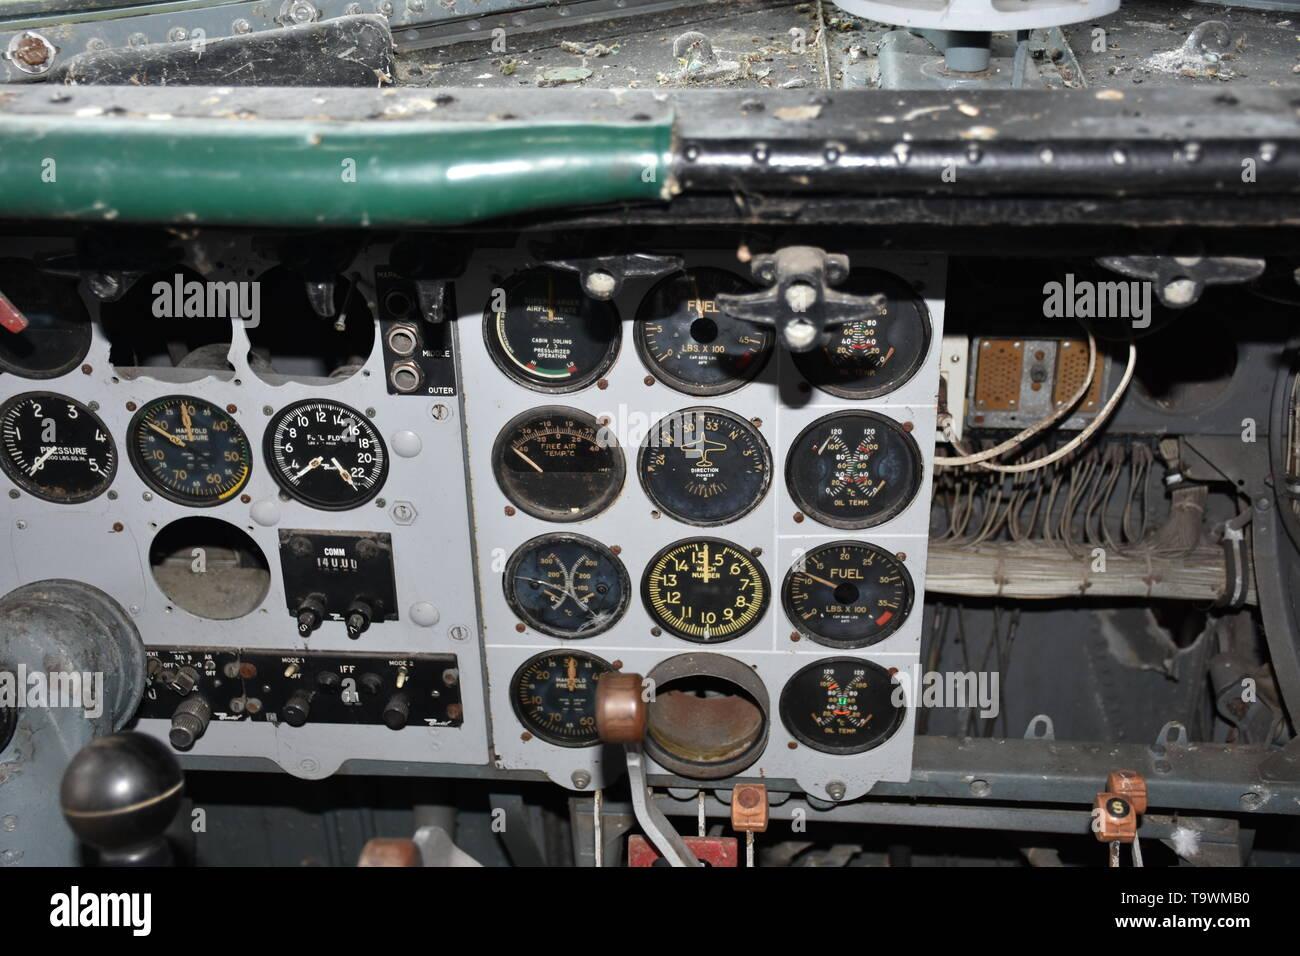 Douglas, DC 6, DC-6, DC6, Flugzeug, Passagiermaschine, ausgemustert, verlassen, vergessen, Friedhof, Flugzeugfriedhof, Instrumente, Messinstrumente, S - Stock Image